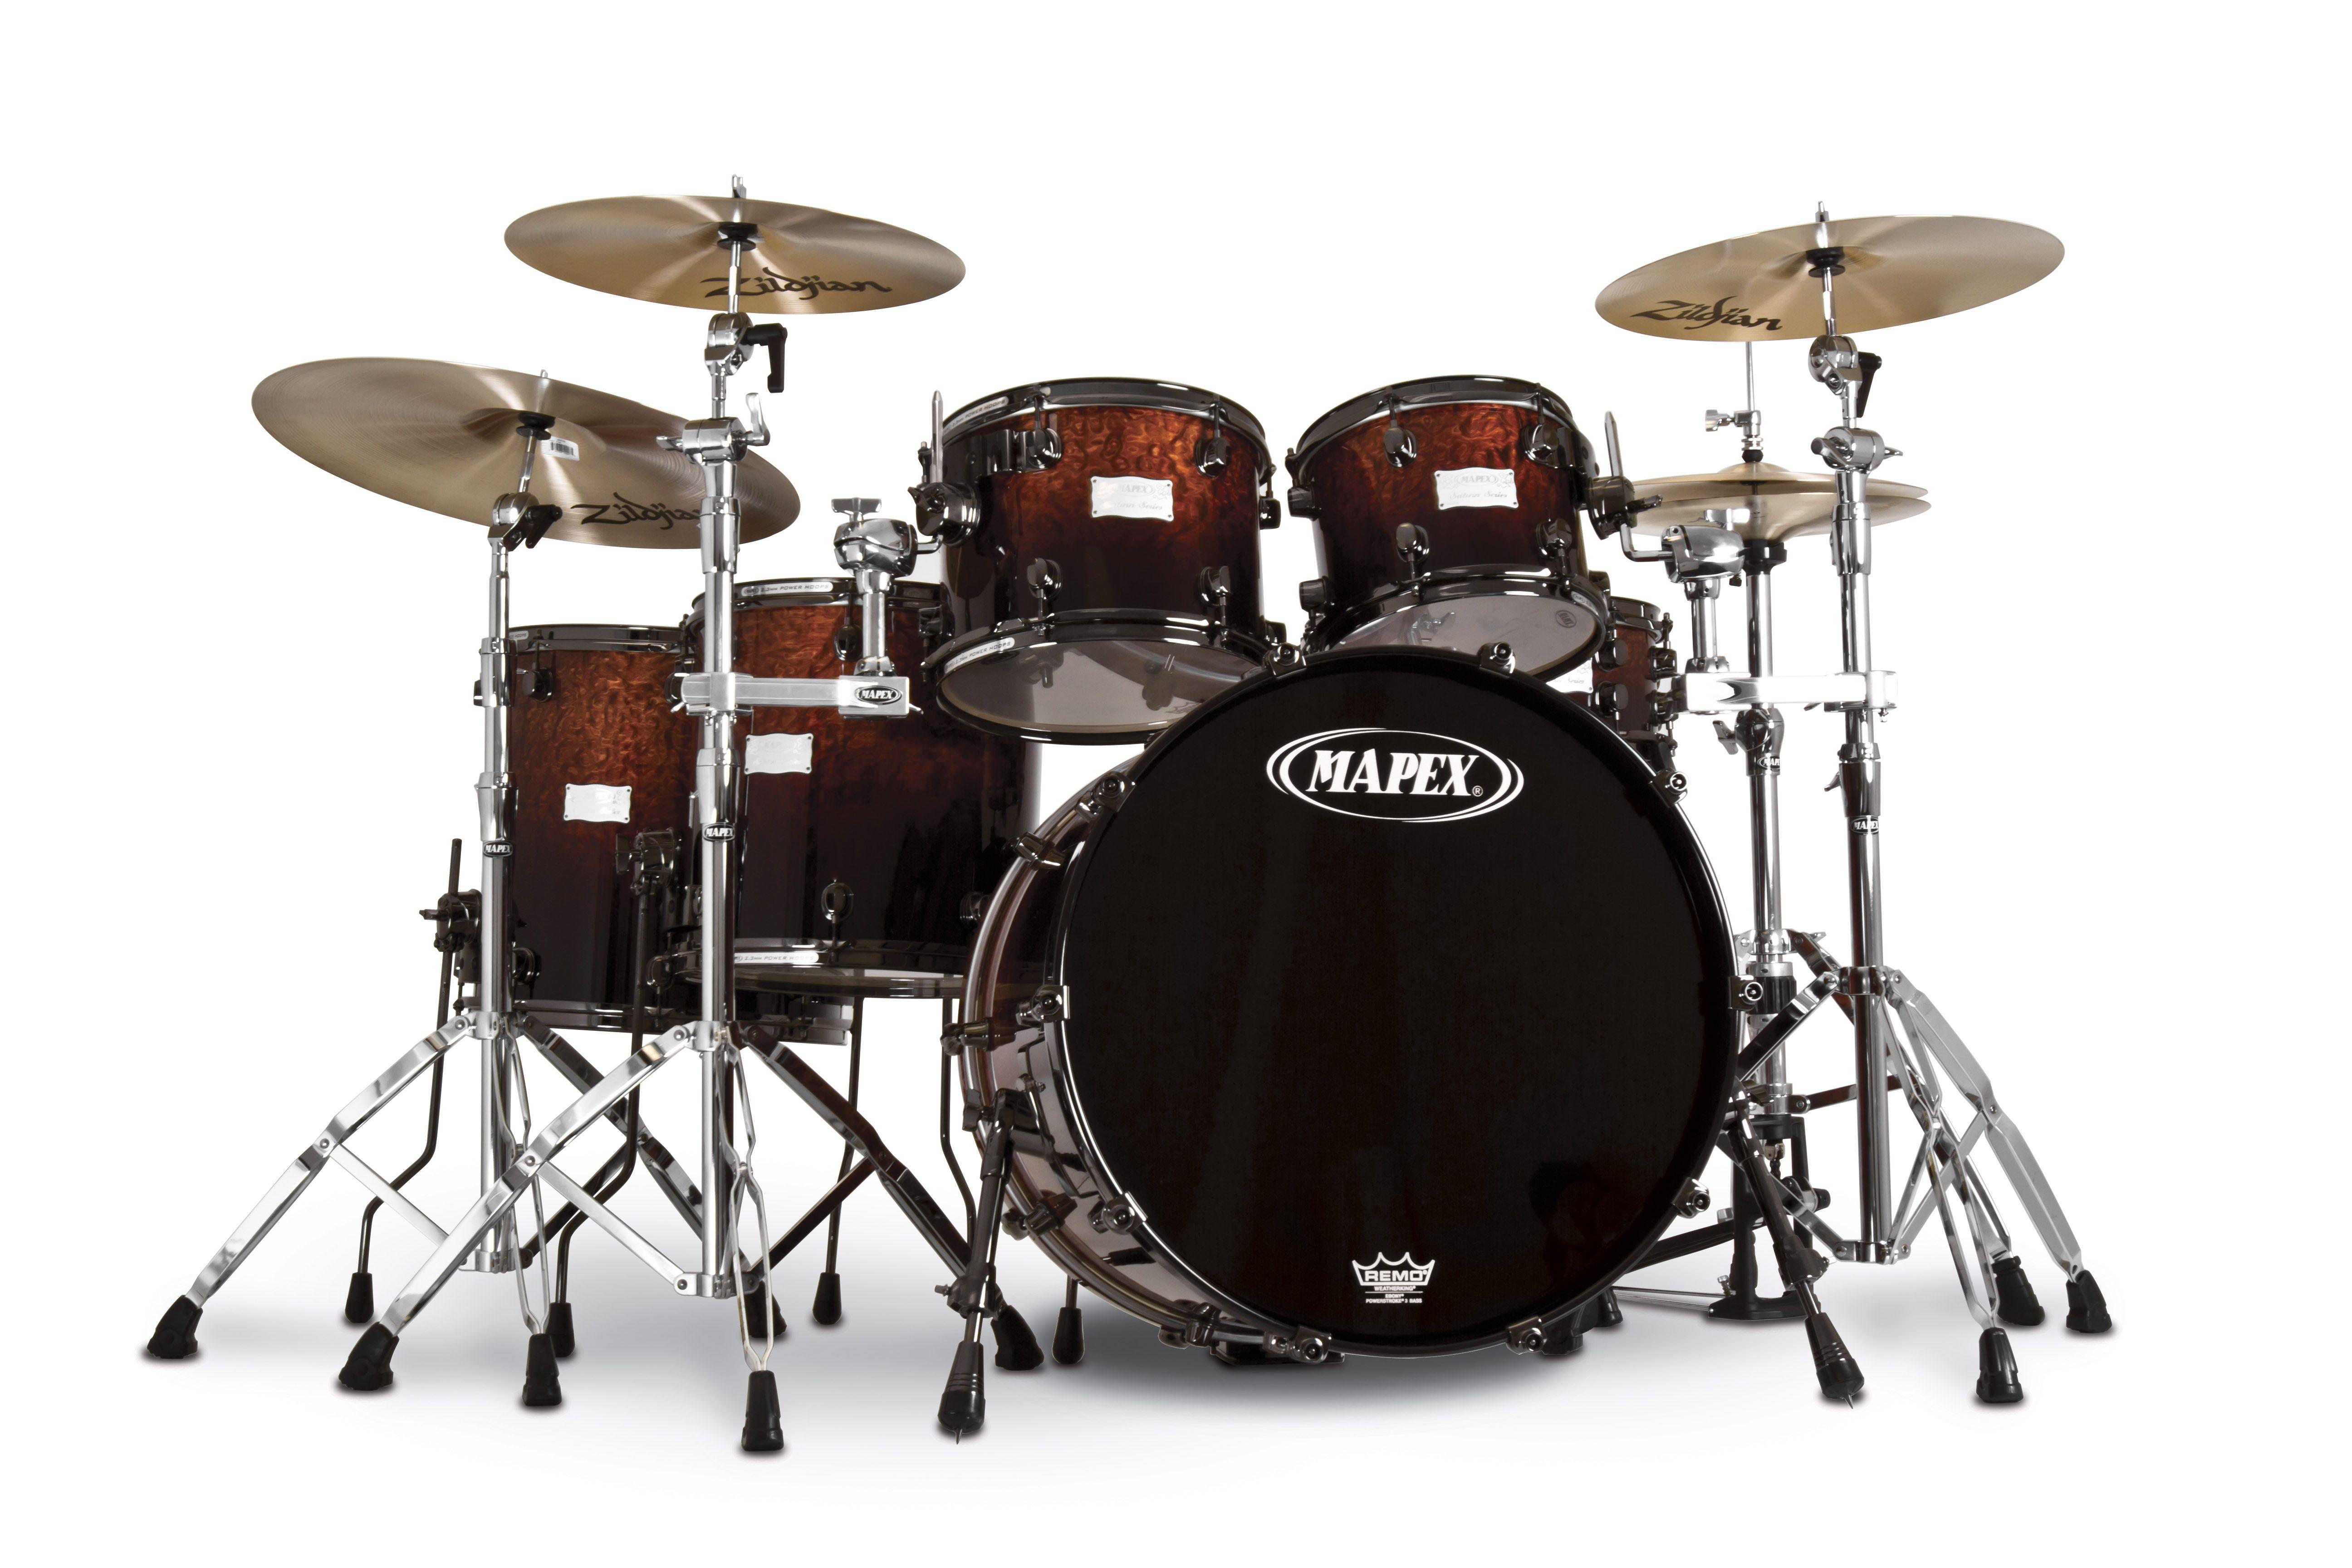 mapex drums saturn series walnut in drums mapex drums drums snare drum. Black Bedroom Furniture Sets. Home Design Ideas